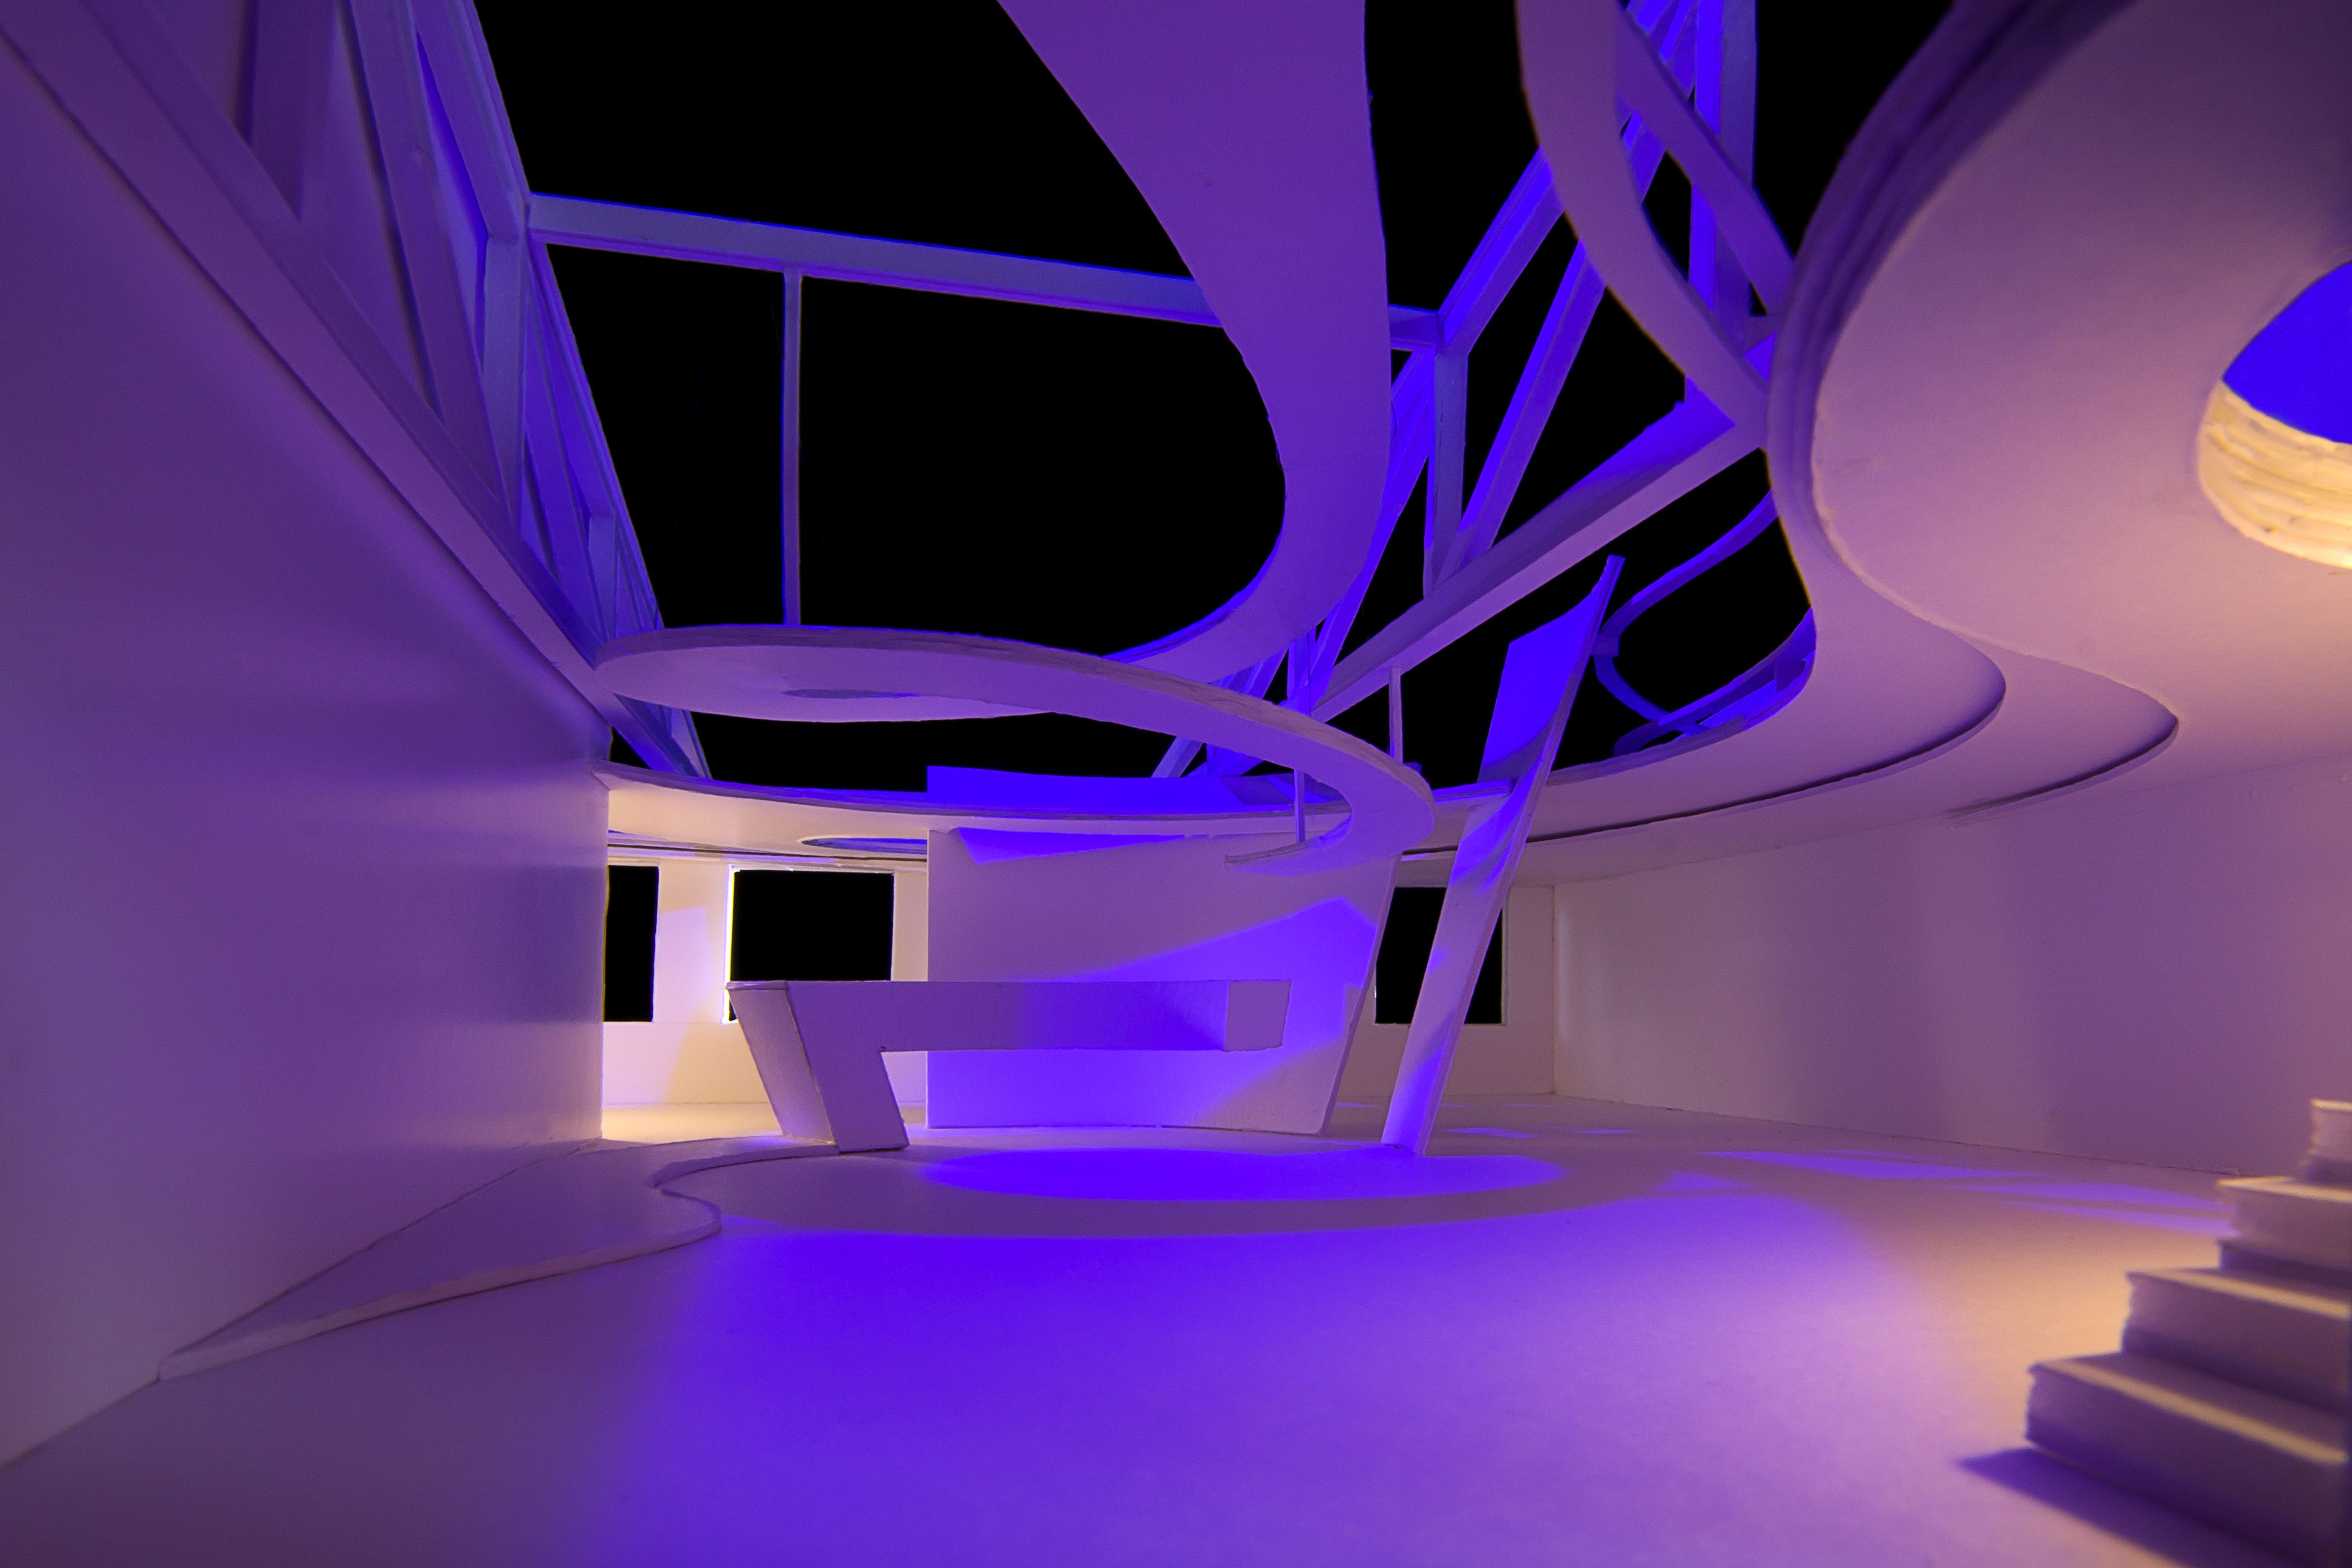 Light Center Speyer - architectural model in purple by Peter Stasek Architect